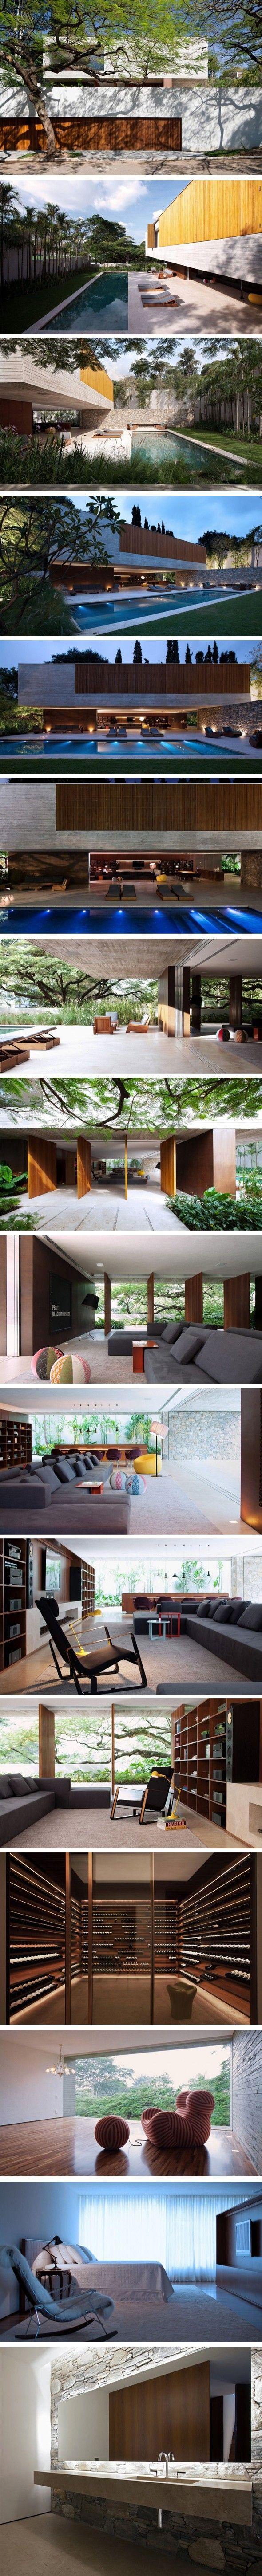 Ipês House par StudioMK27